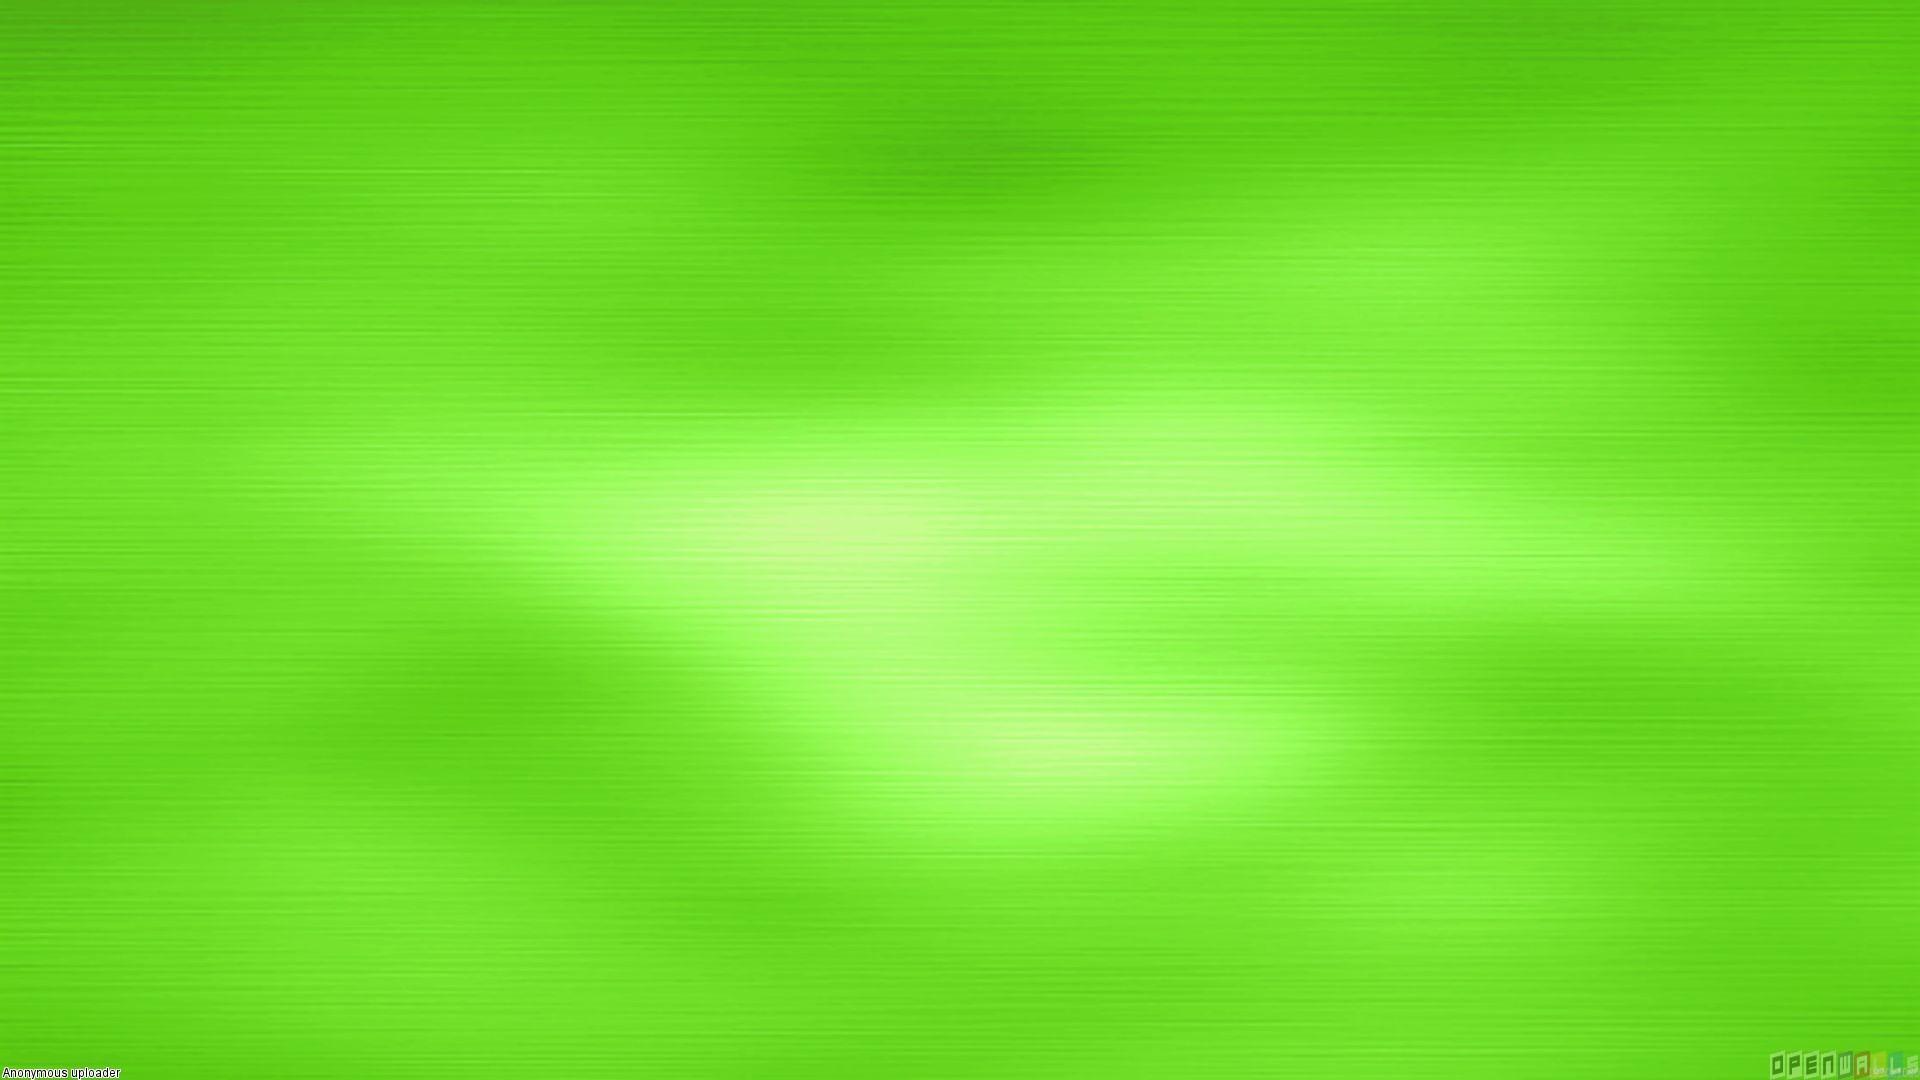 green-background-wallpaper-6 - WellnessDoc.com